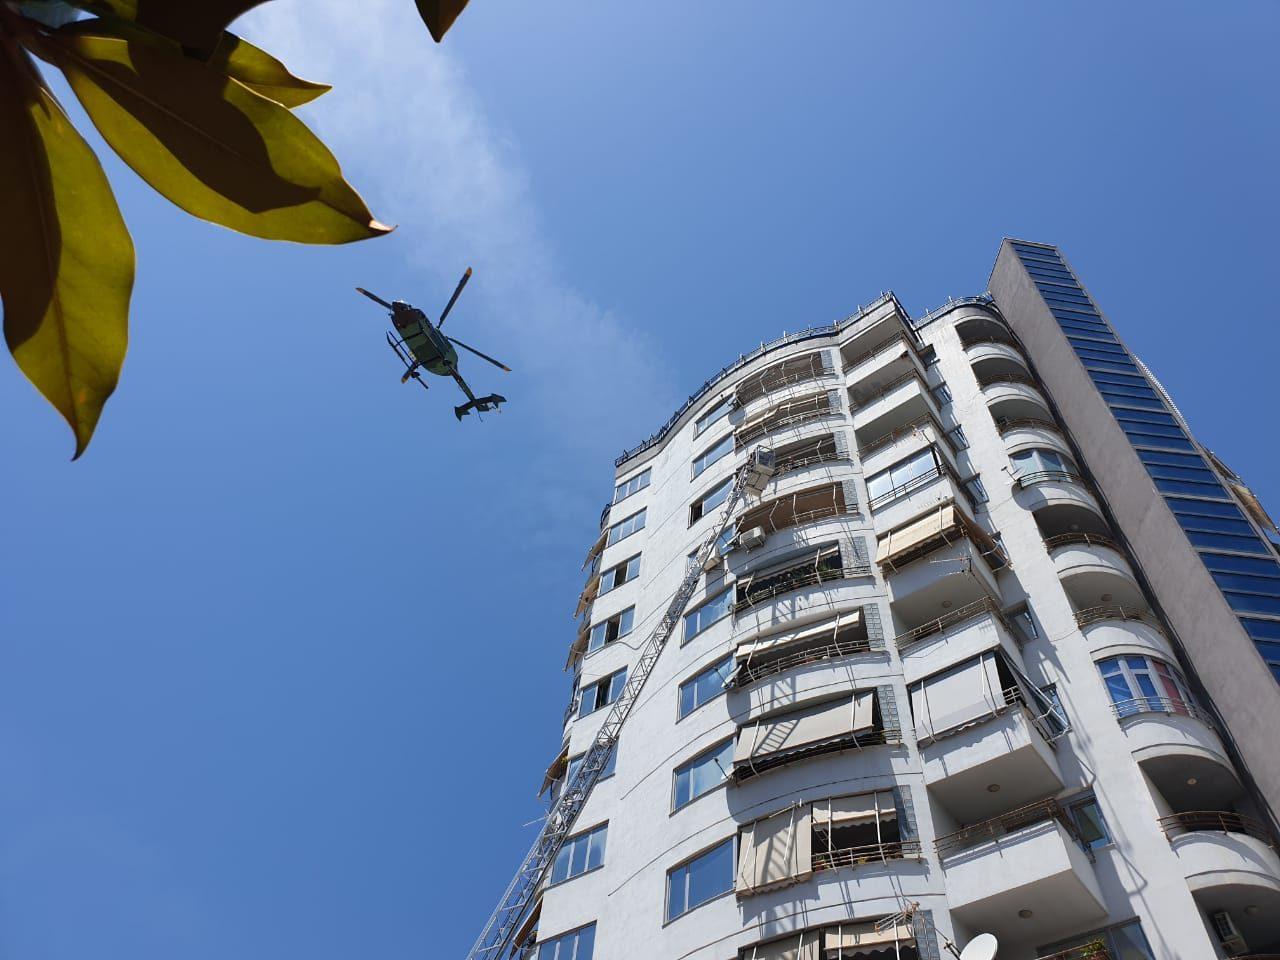 helikopteri-1280x960.jpg